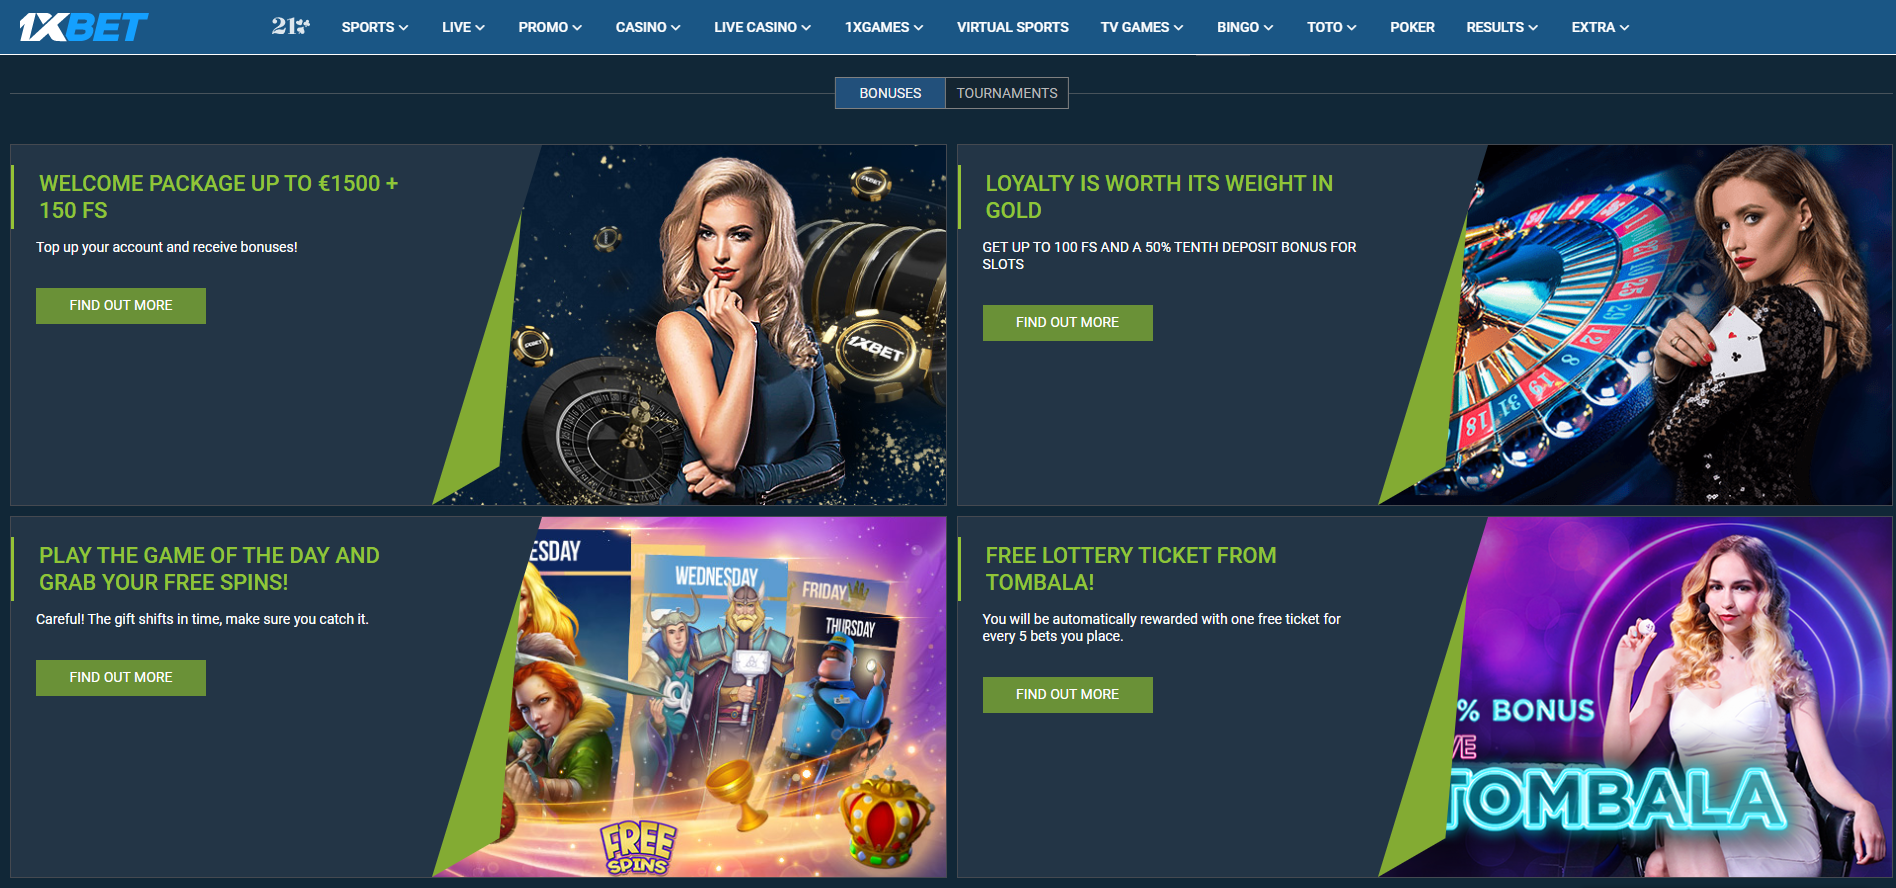 1xbet kazino premija casino bonus 1xbet bonus code promo code no deposit bonus - welcome package 1500€ tombala live dealer free spins